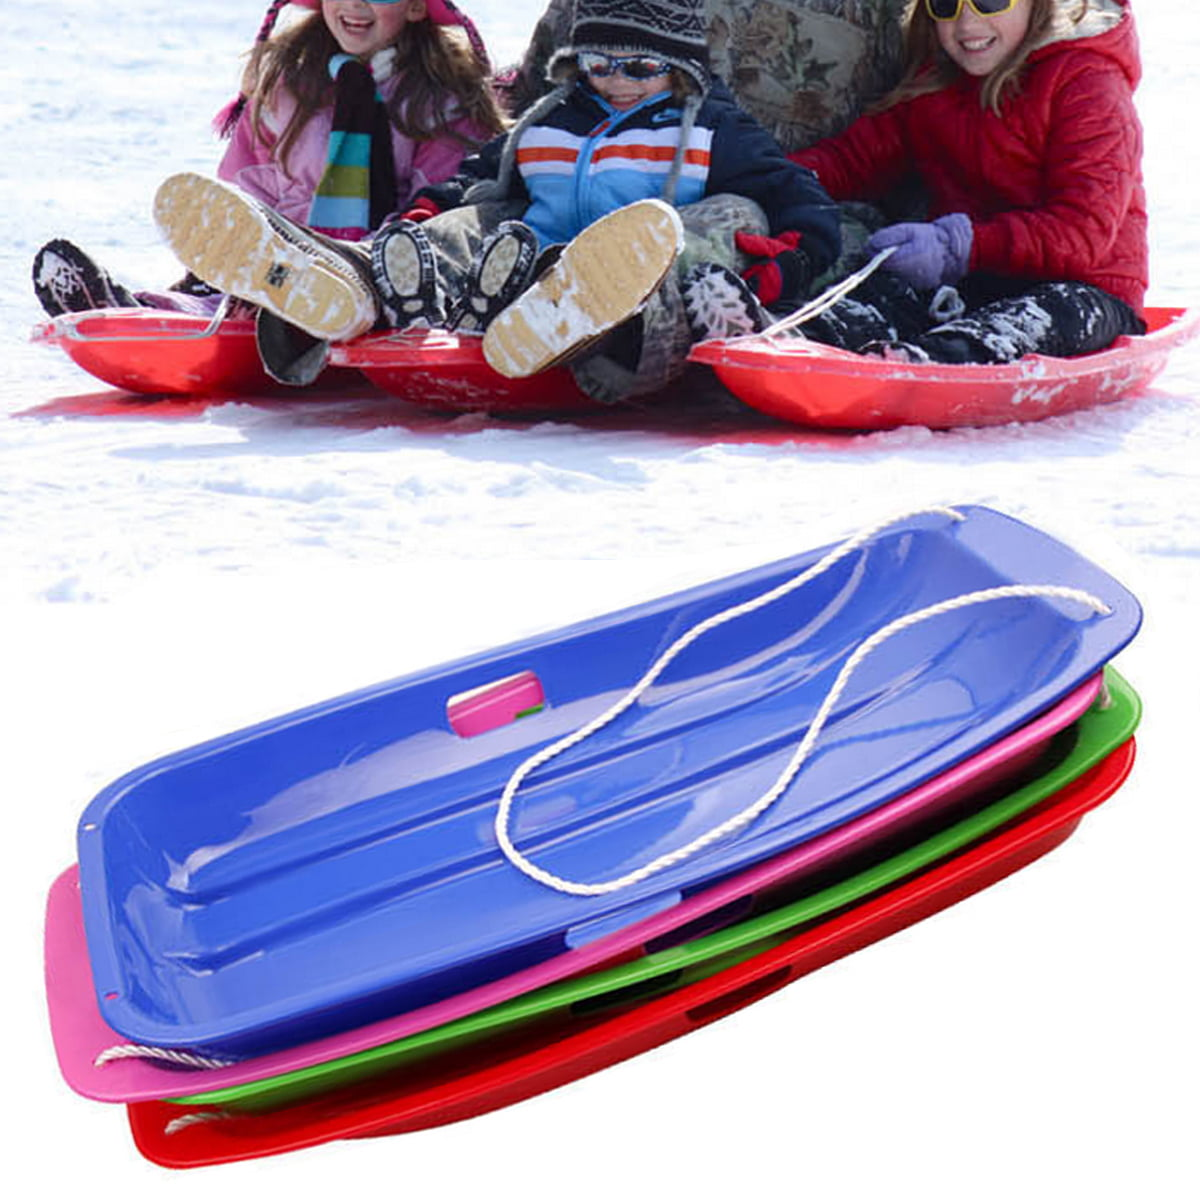 Snow Sled Toboggans Snow Grass Sand Board Ski Pad Snowboard Sled Luge Snow Sledding Equipment for Children Kids Snow Sledges Board Outdoor Winter Plastic Skiing Board Snow Sleds Blue